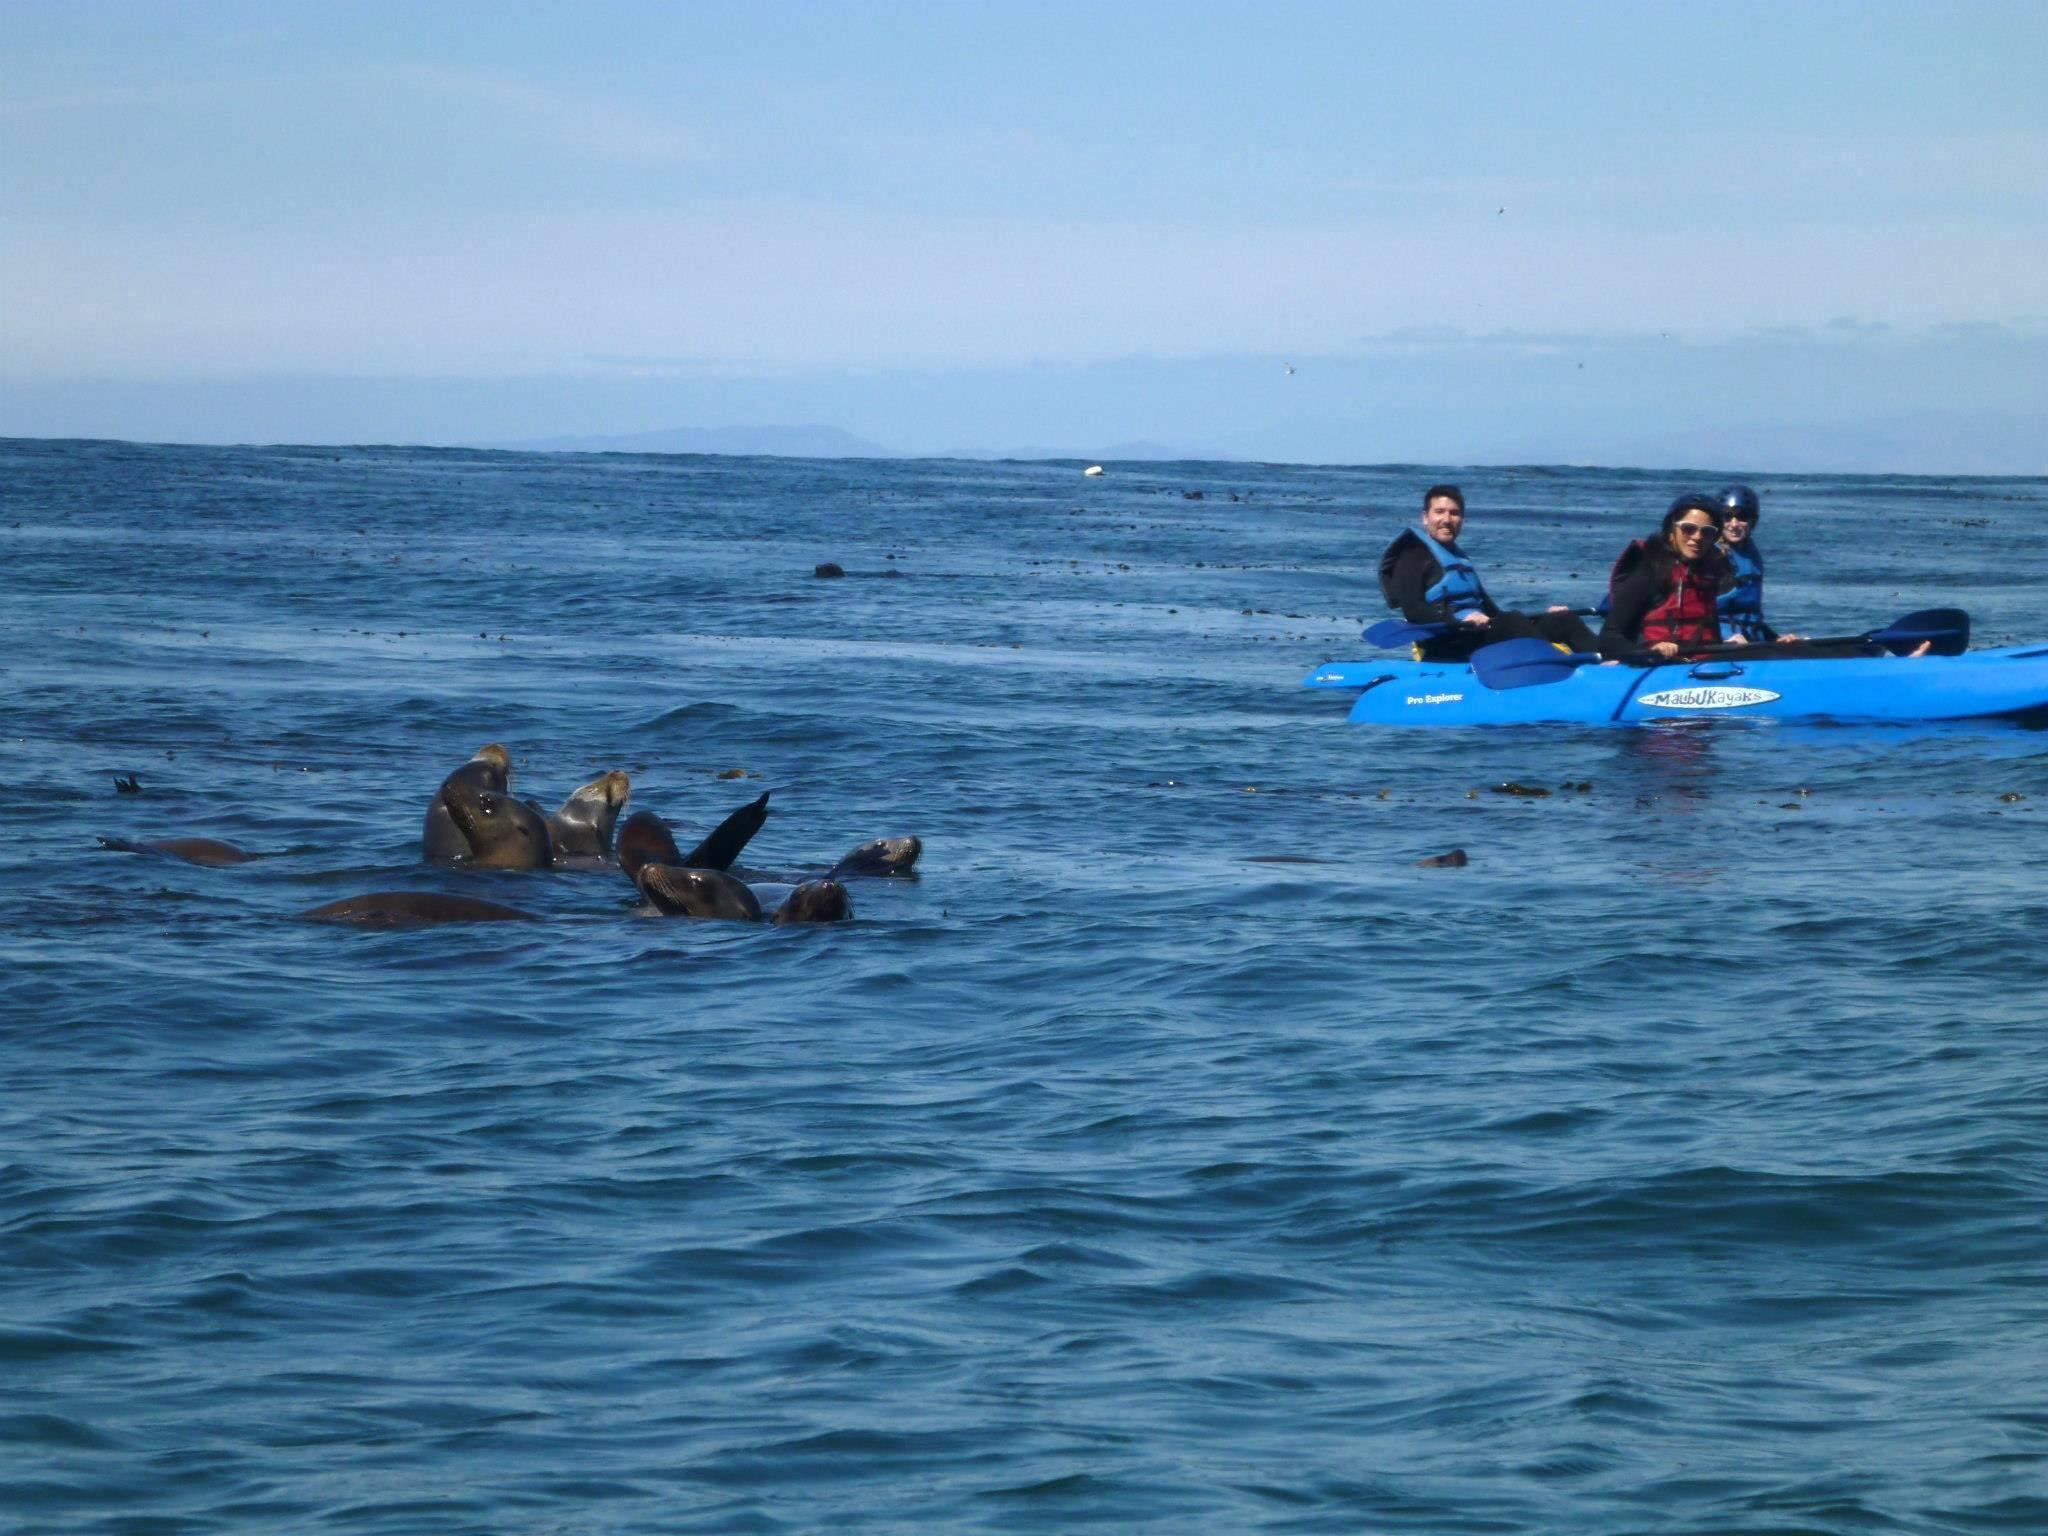 La Jolla Sea Caves Kayak Tour Hike Bike Kayak Adventure Tours